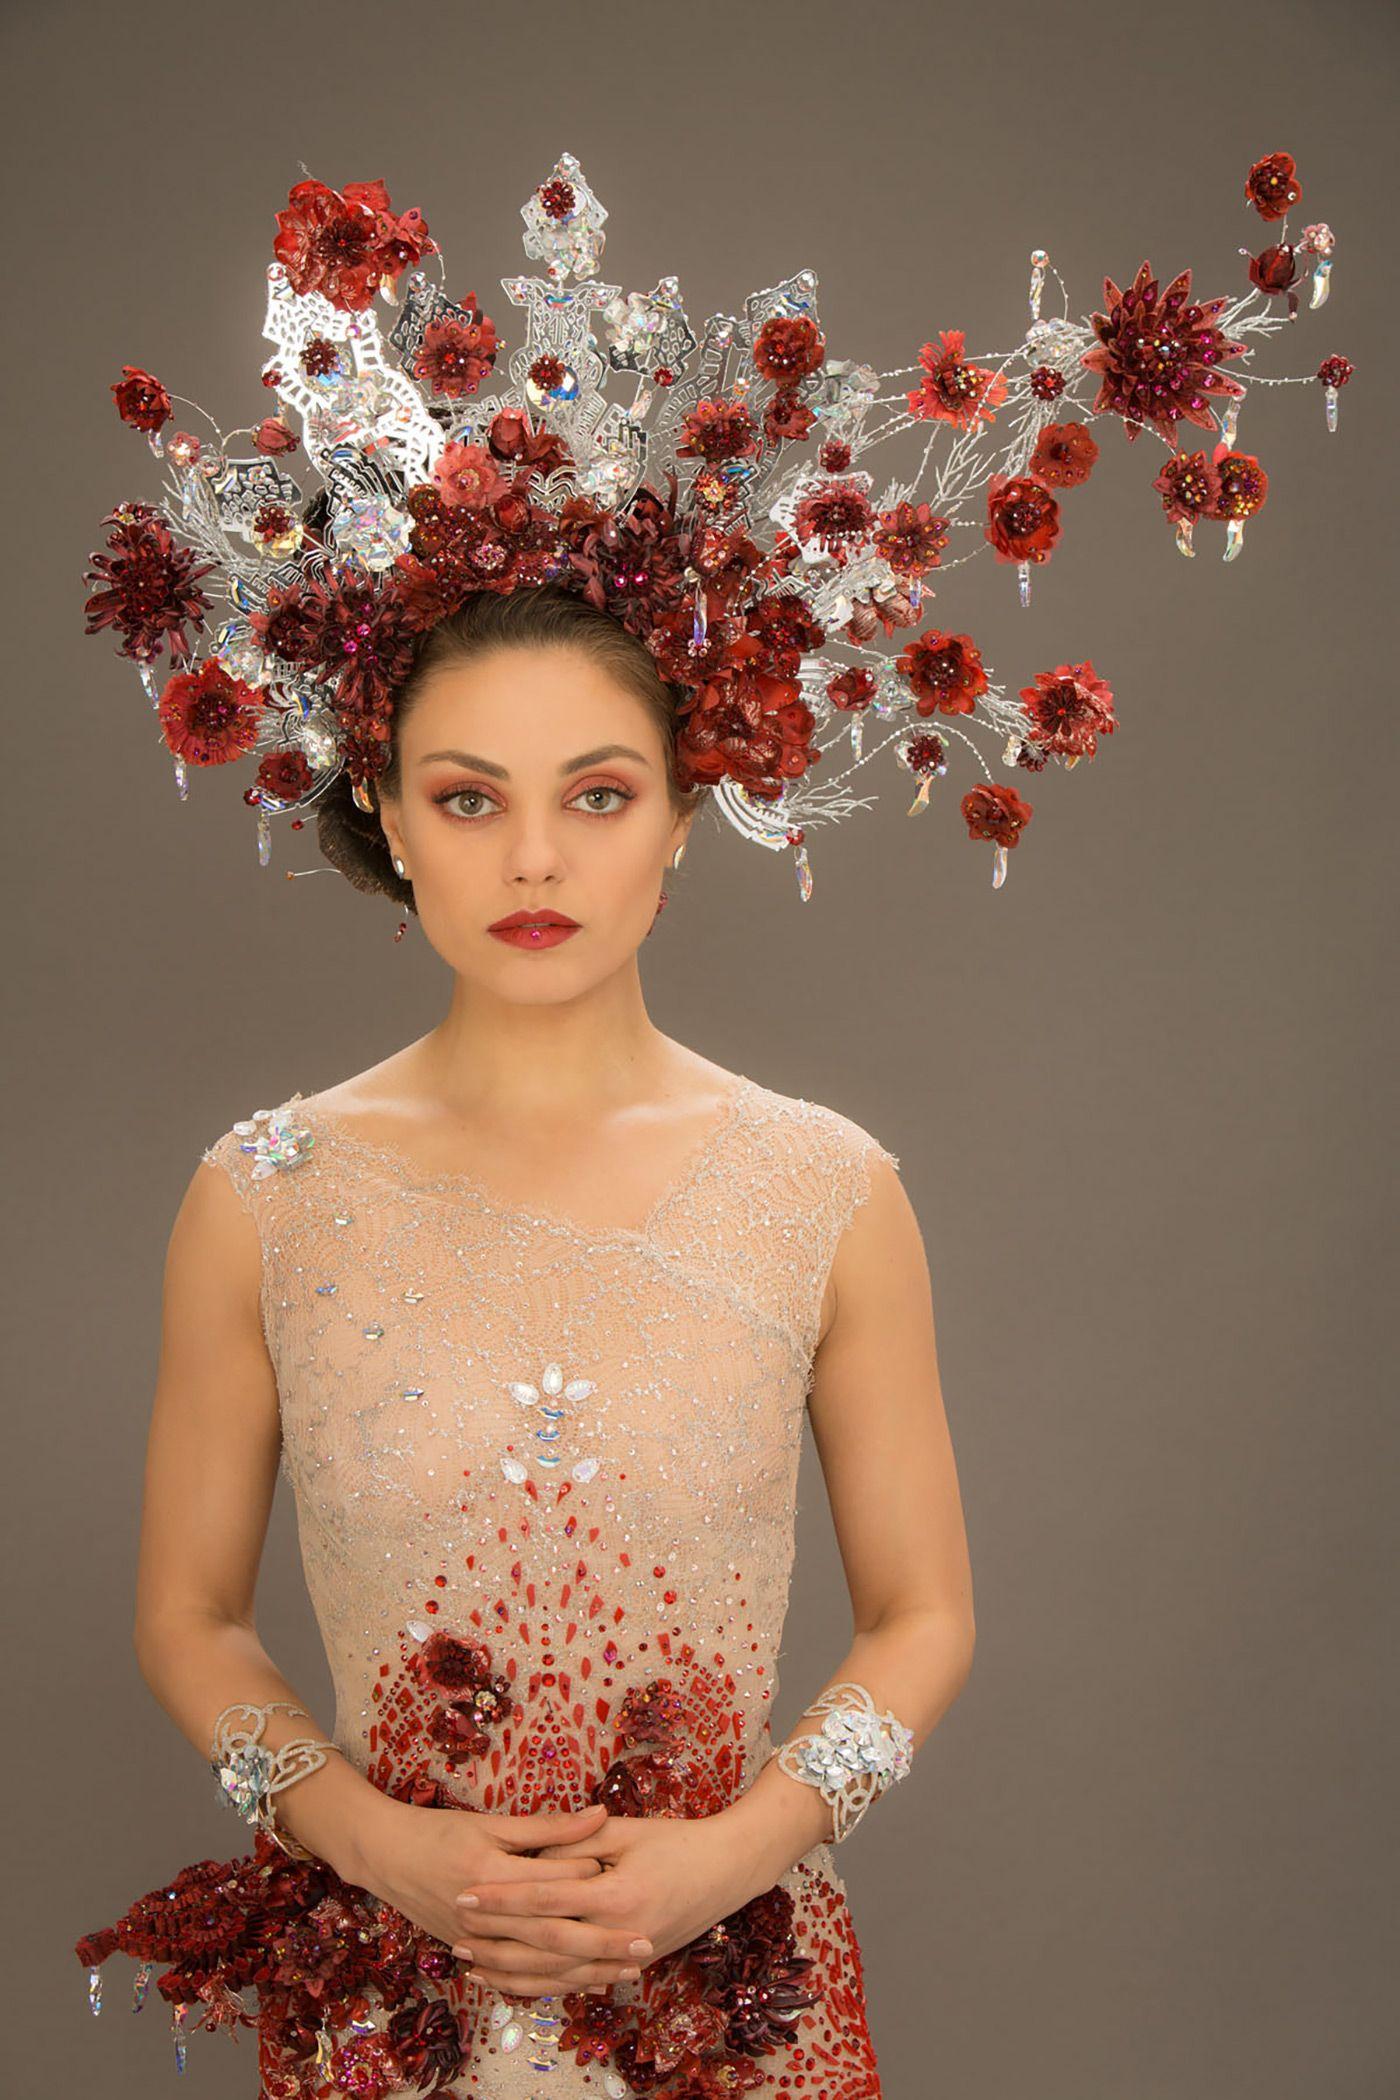 Wedding - Jupiter Jones' Mila Kunis Dress Appears In Film